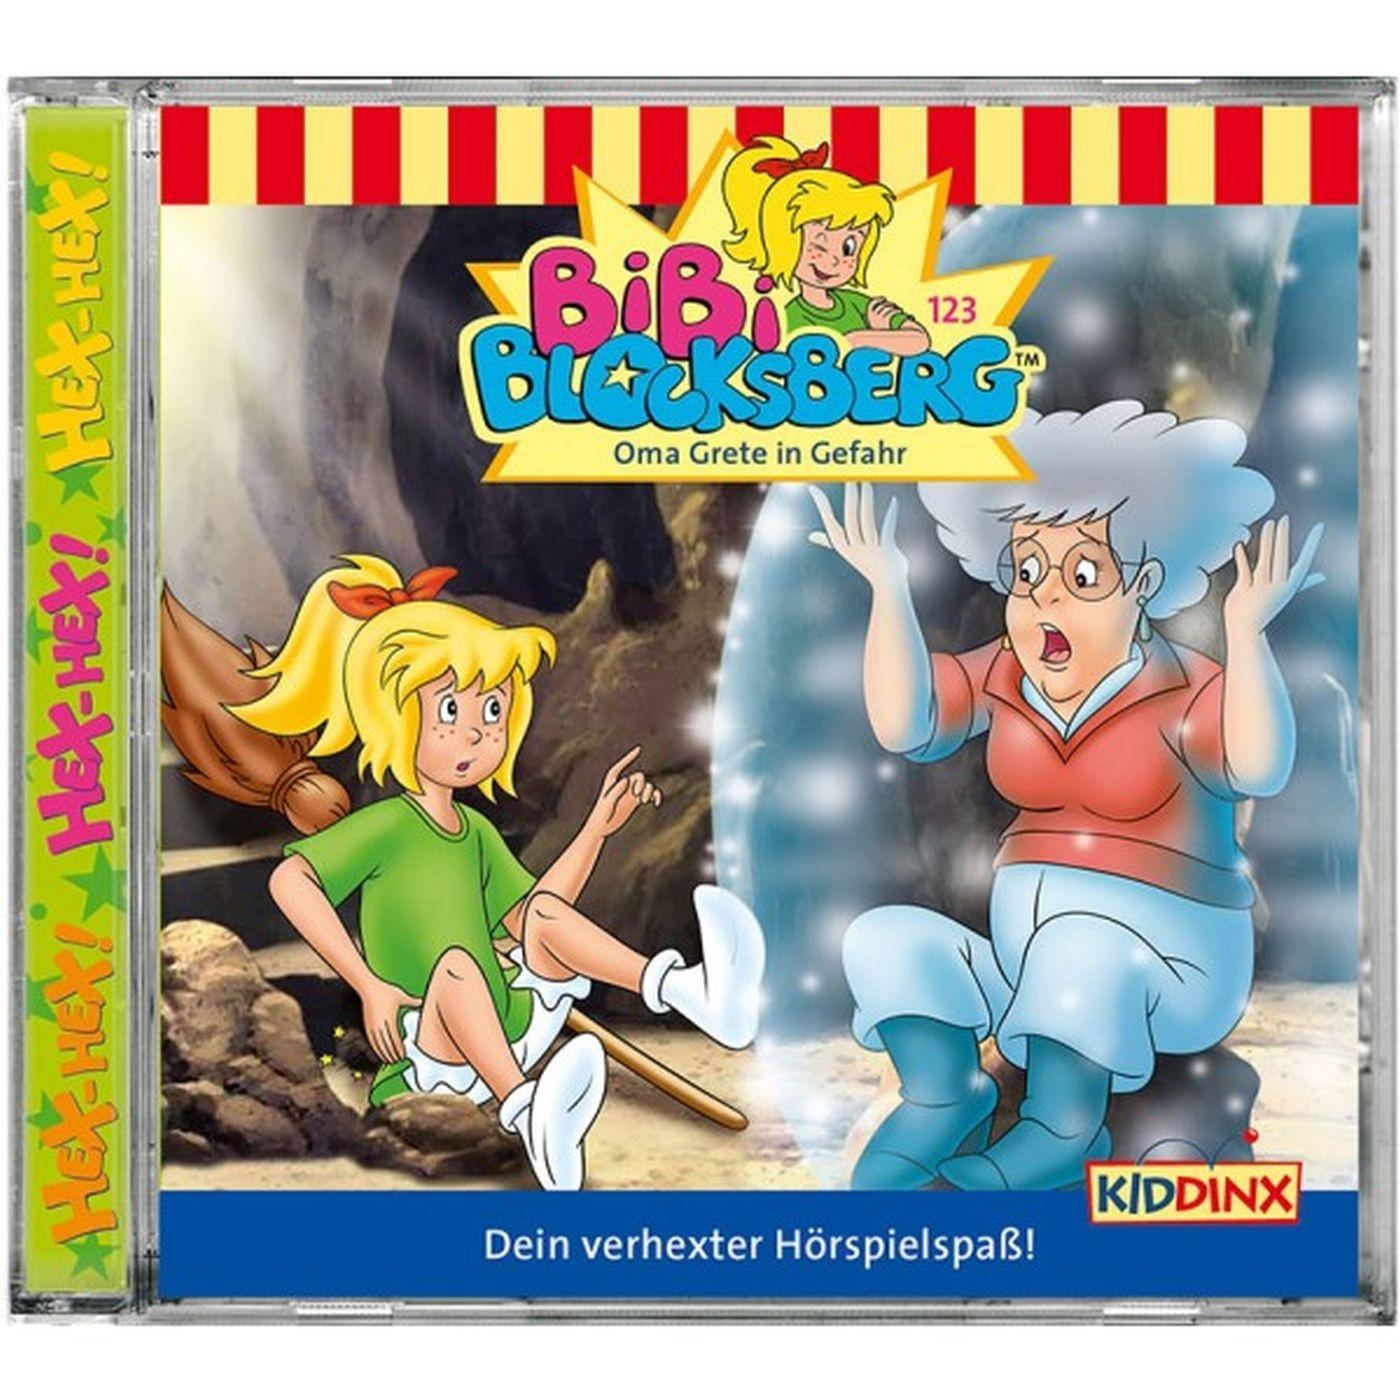 Bibi Blocksberg - Folge 123: Oma Grete in Gefahr (CD)